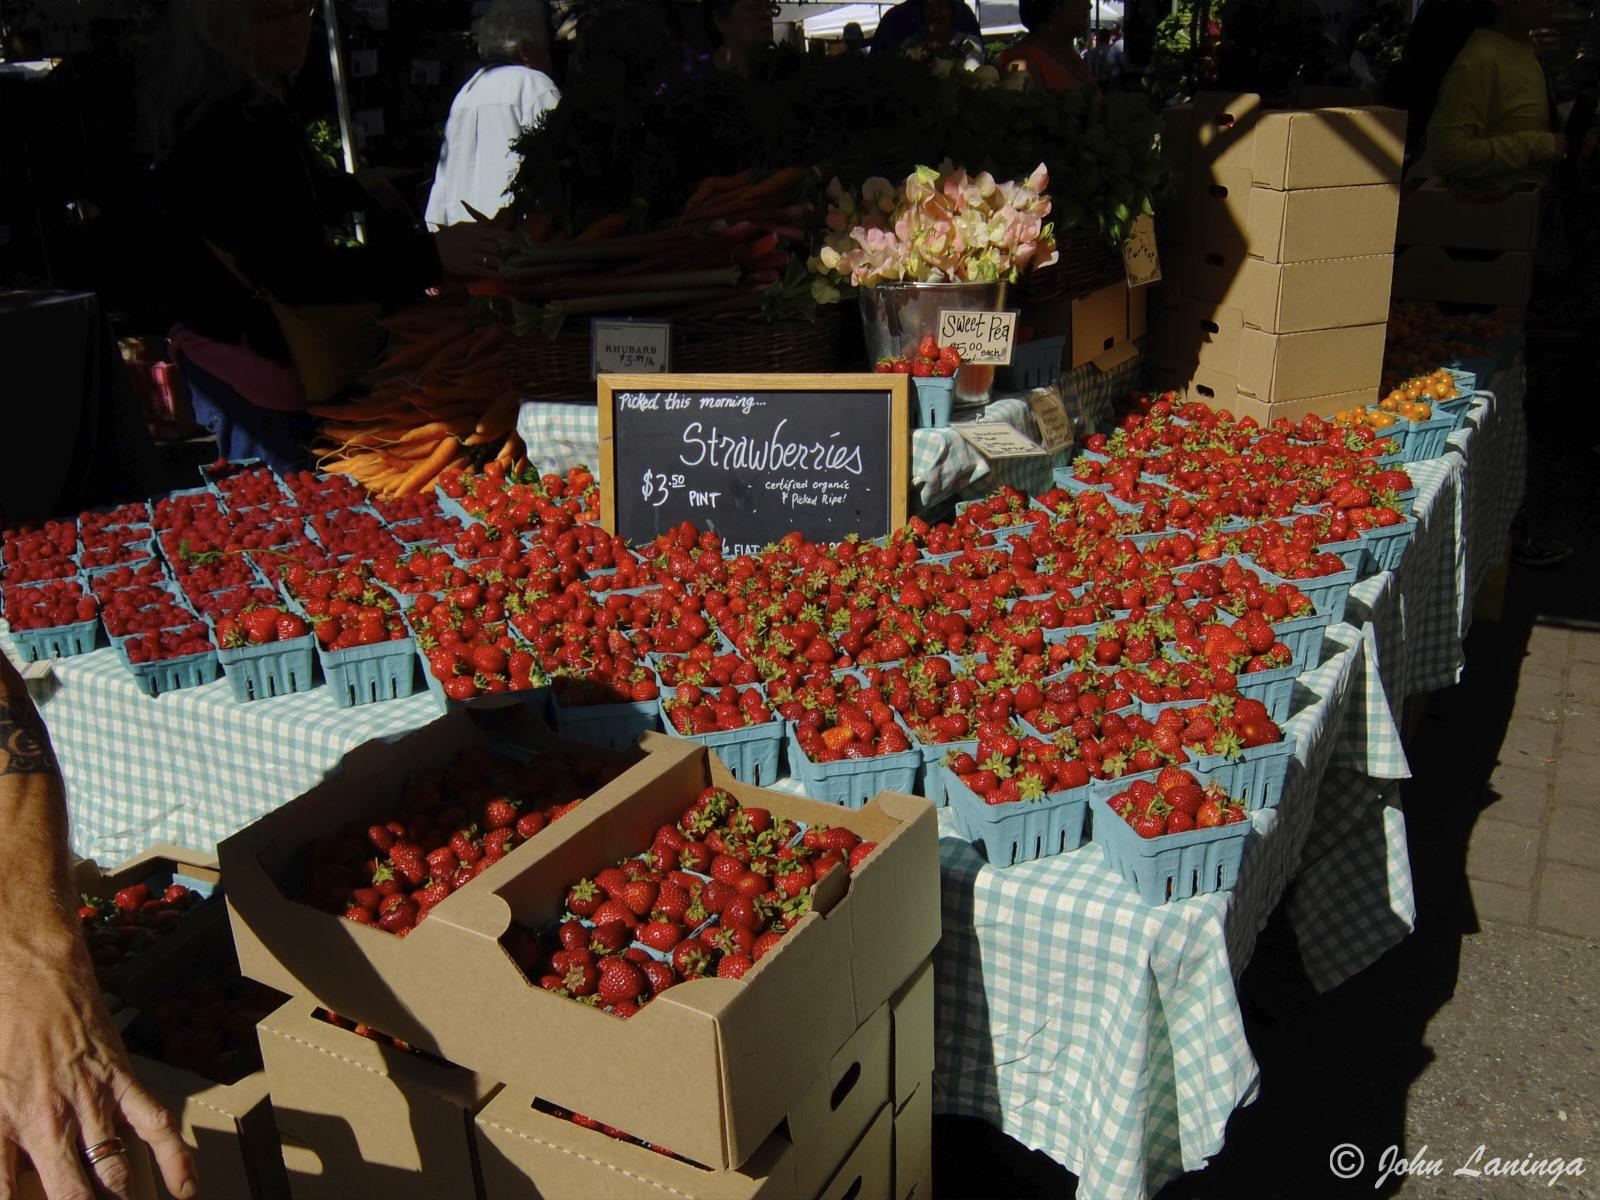 Farm market in Eugene